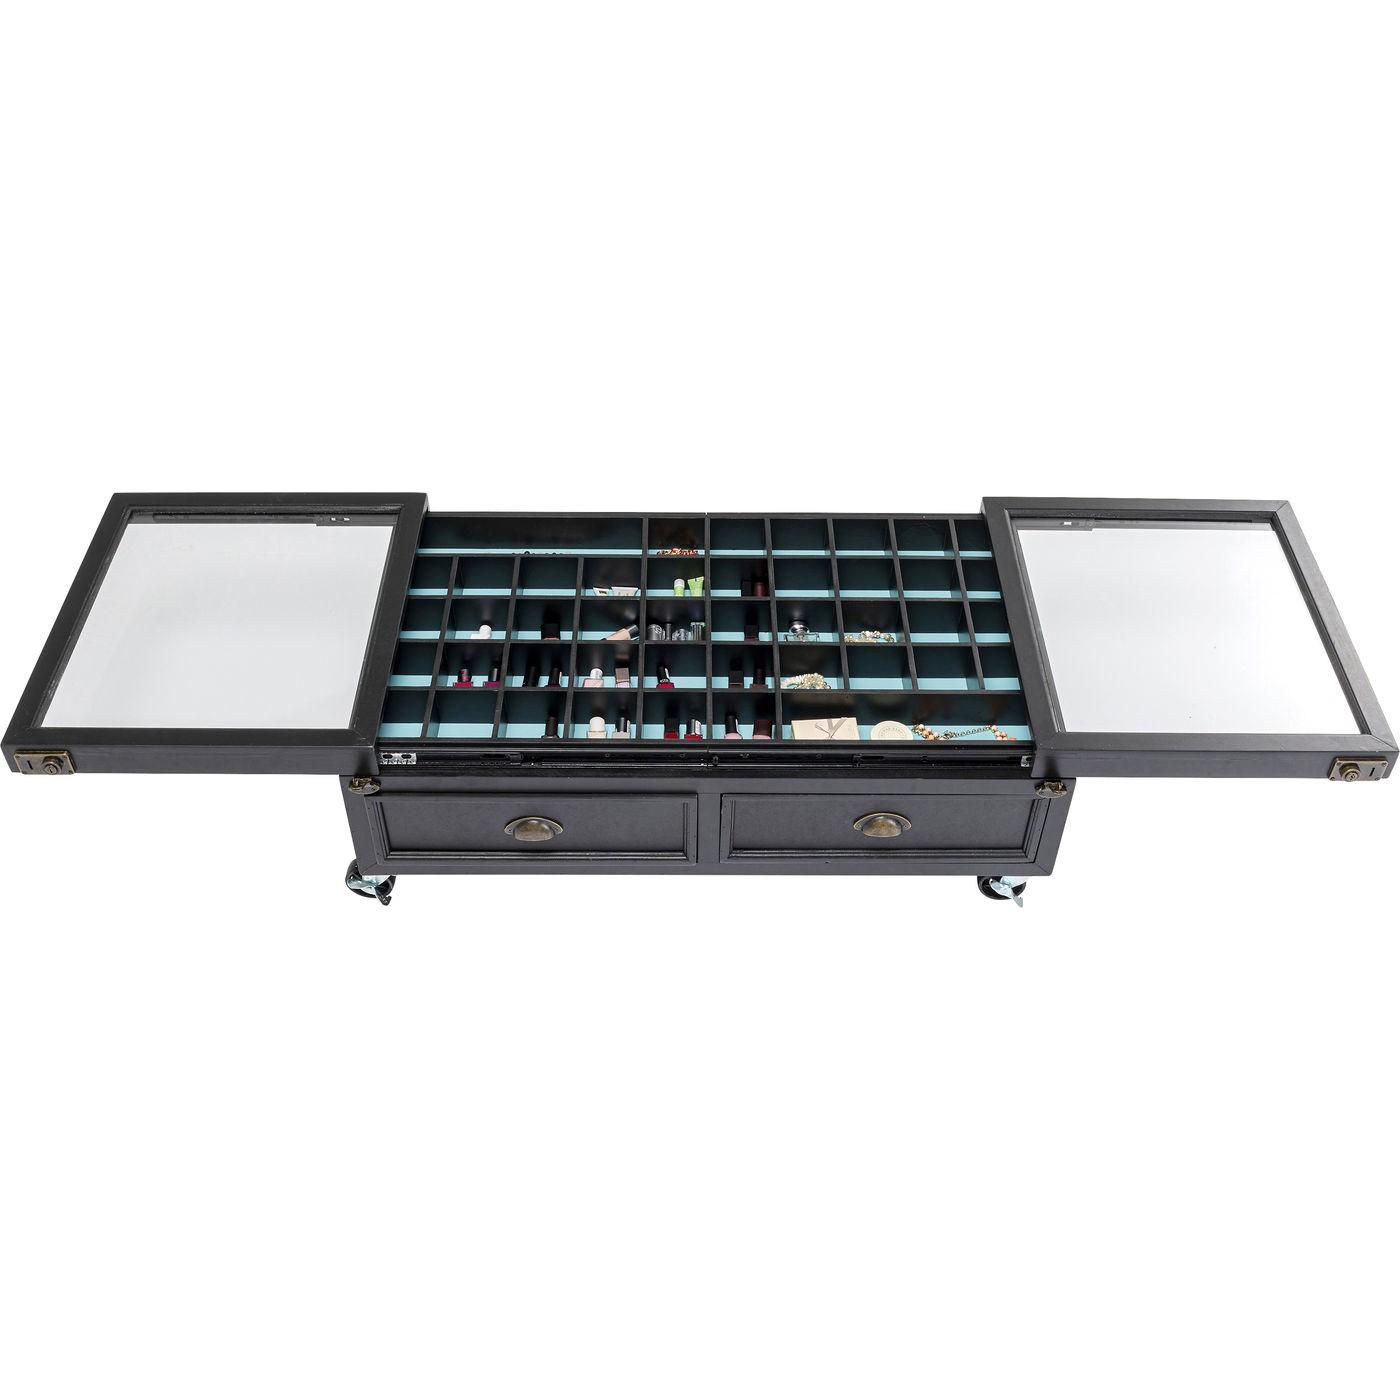 Table basse Collector Double 100x58cm noire Kare Design